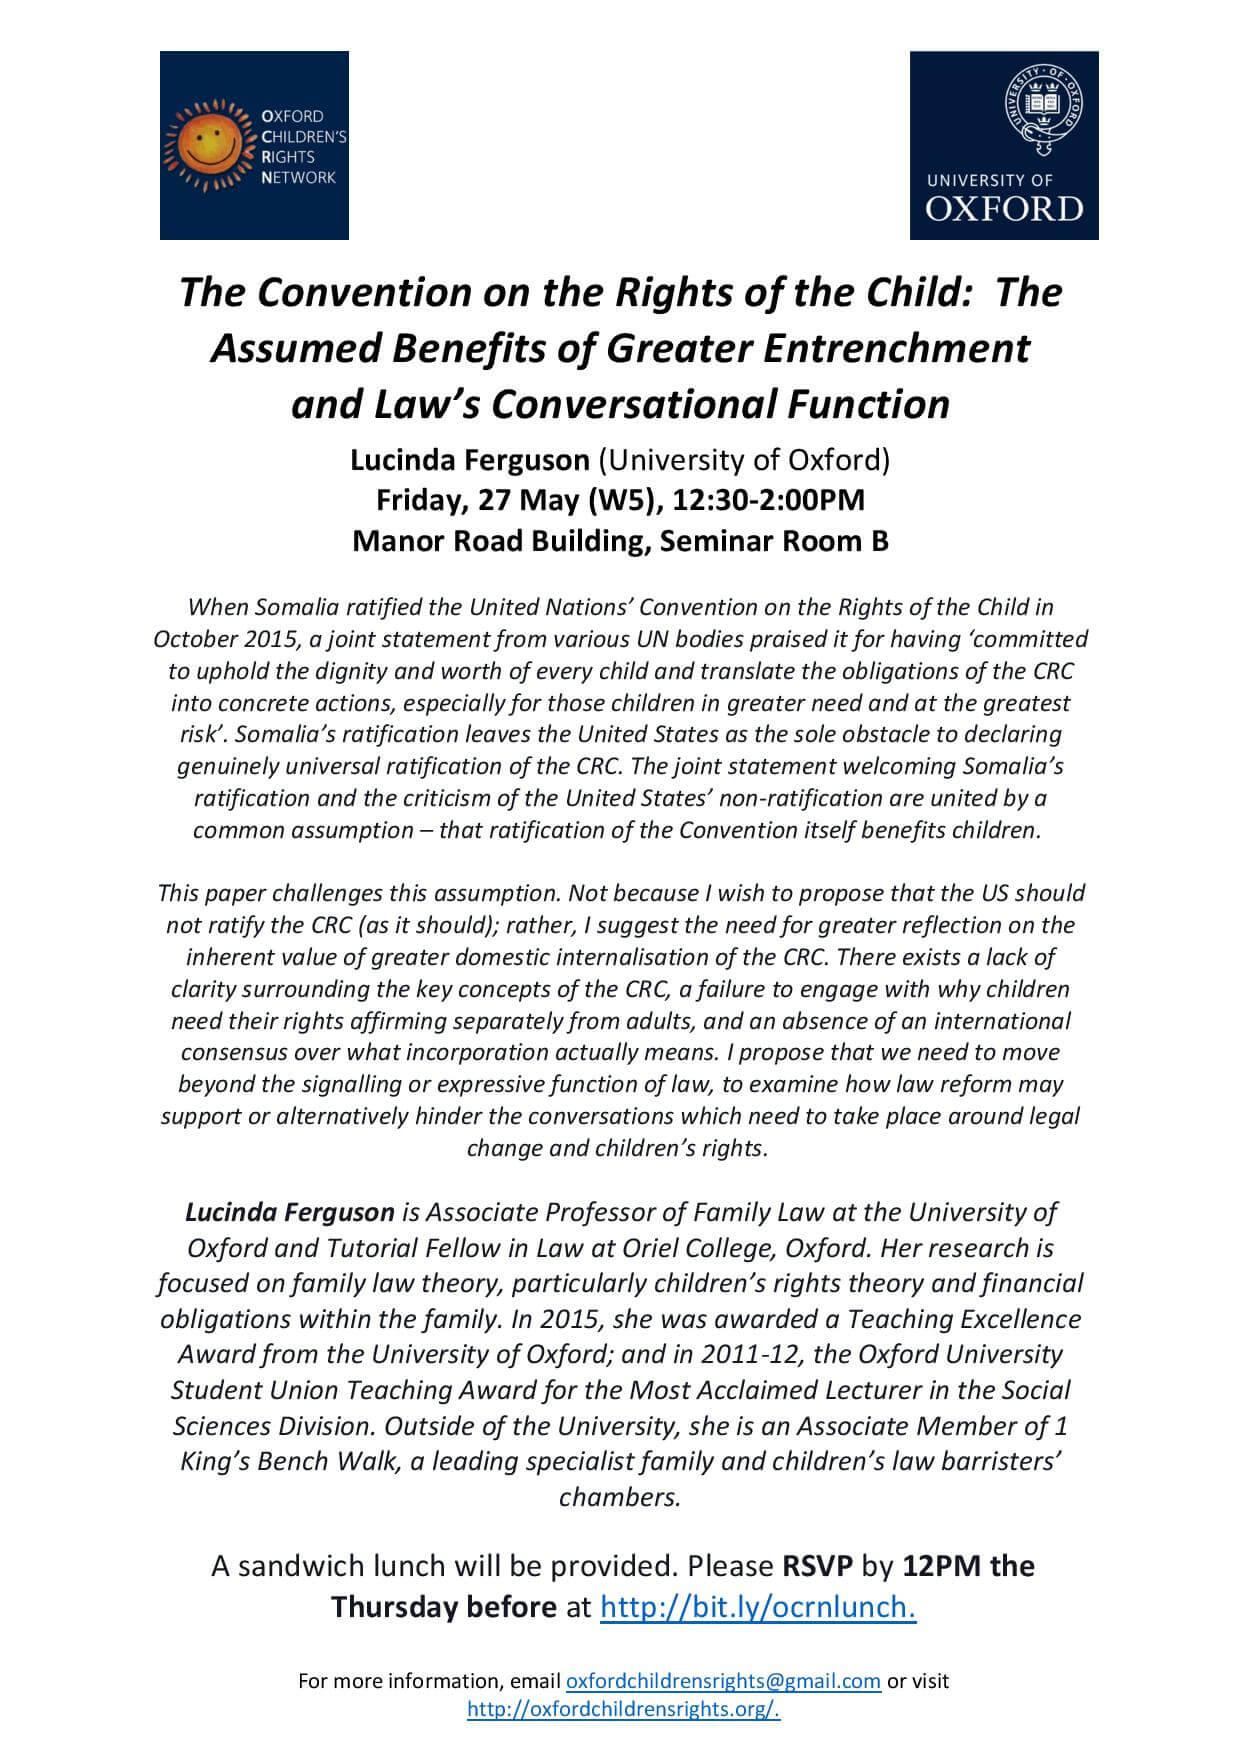 Oxford Child Rights Network-Upcoming Seminar